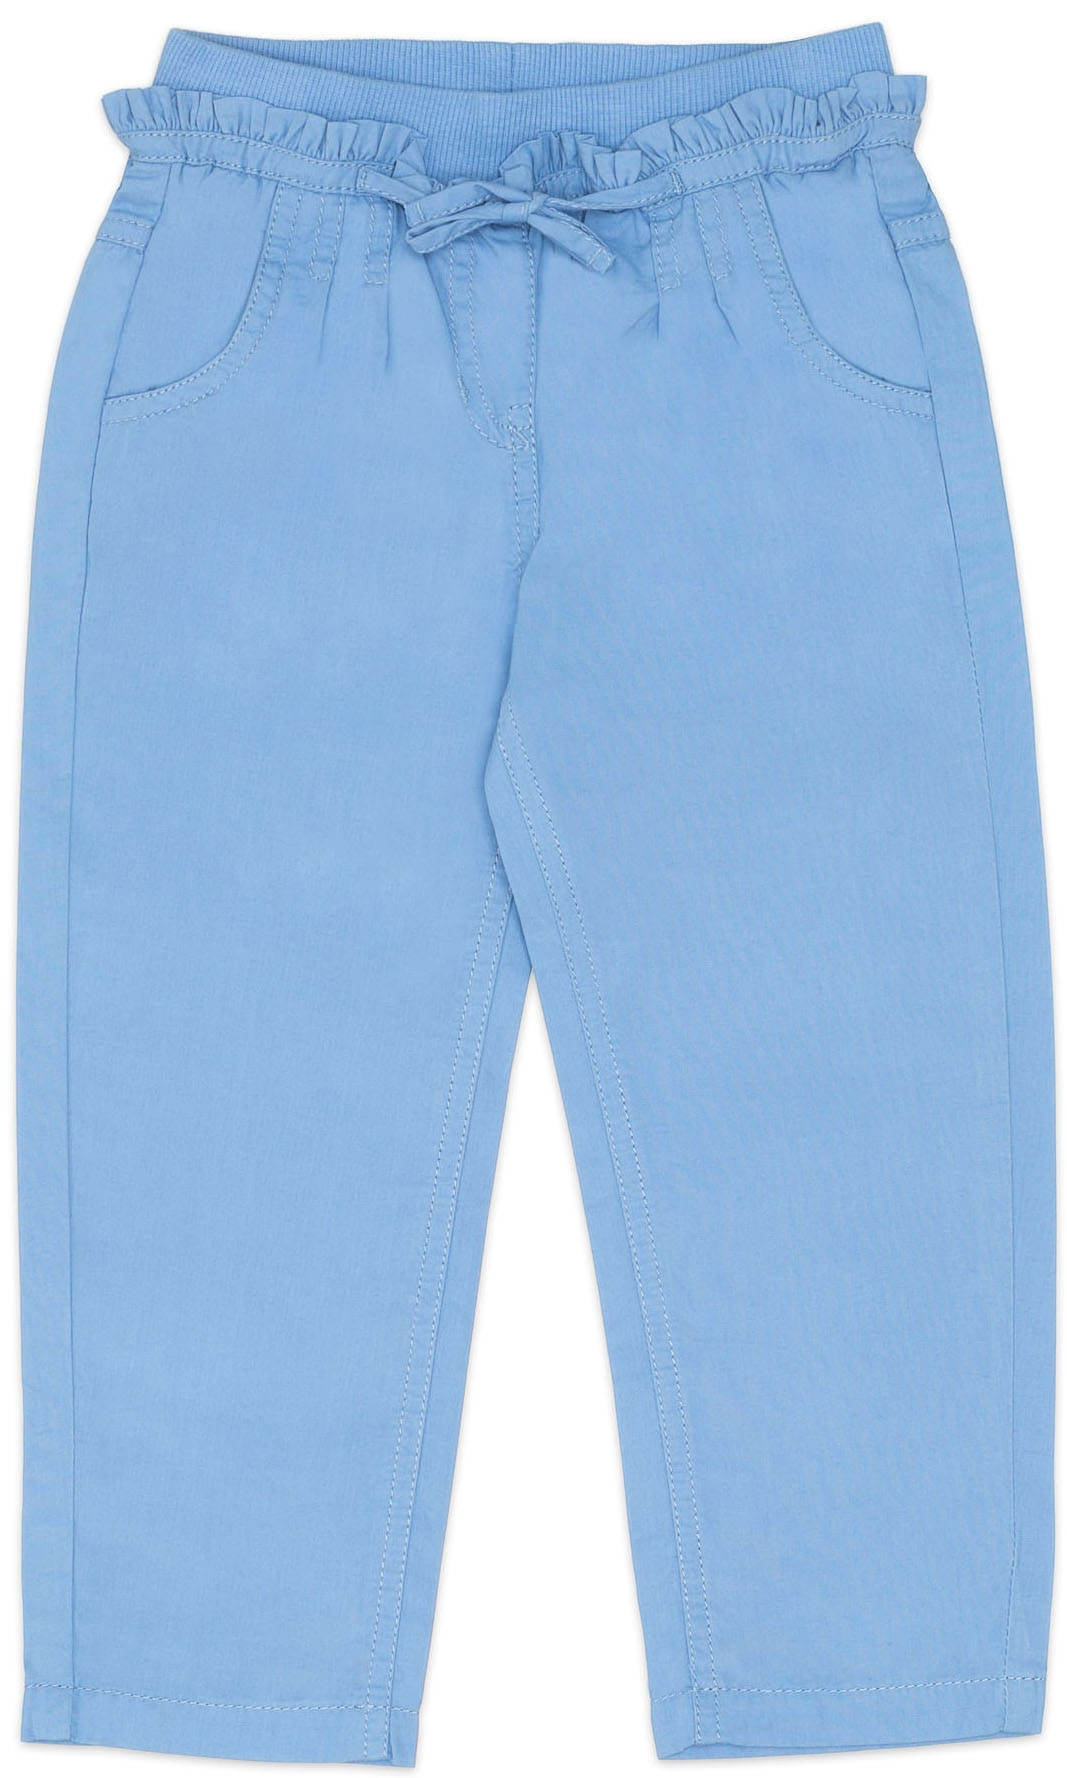 Брюки Barkito Брюки для девочки Barkito, У синего-синего моря, голубые брюки barkito салатовая